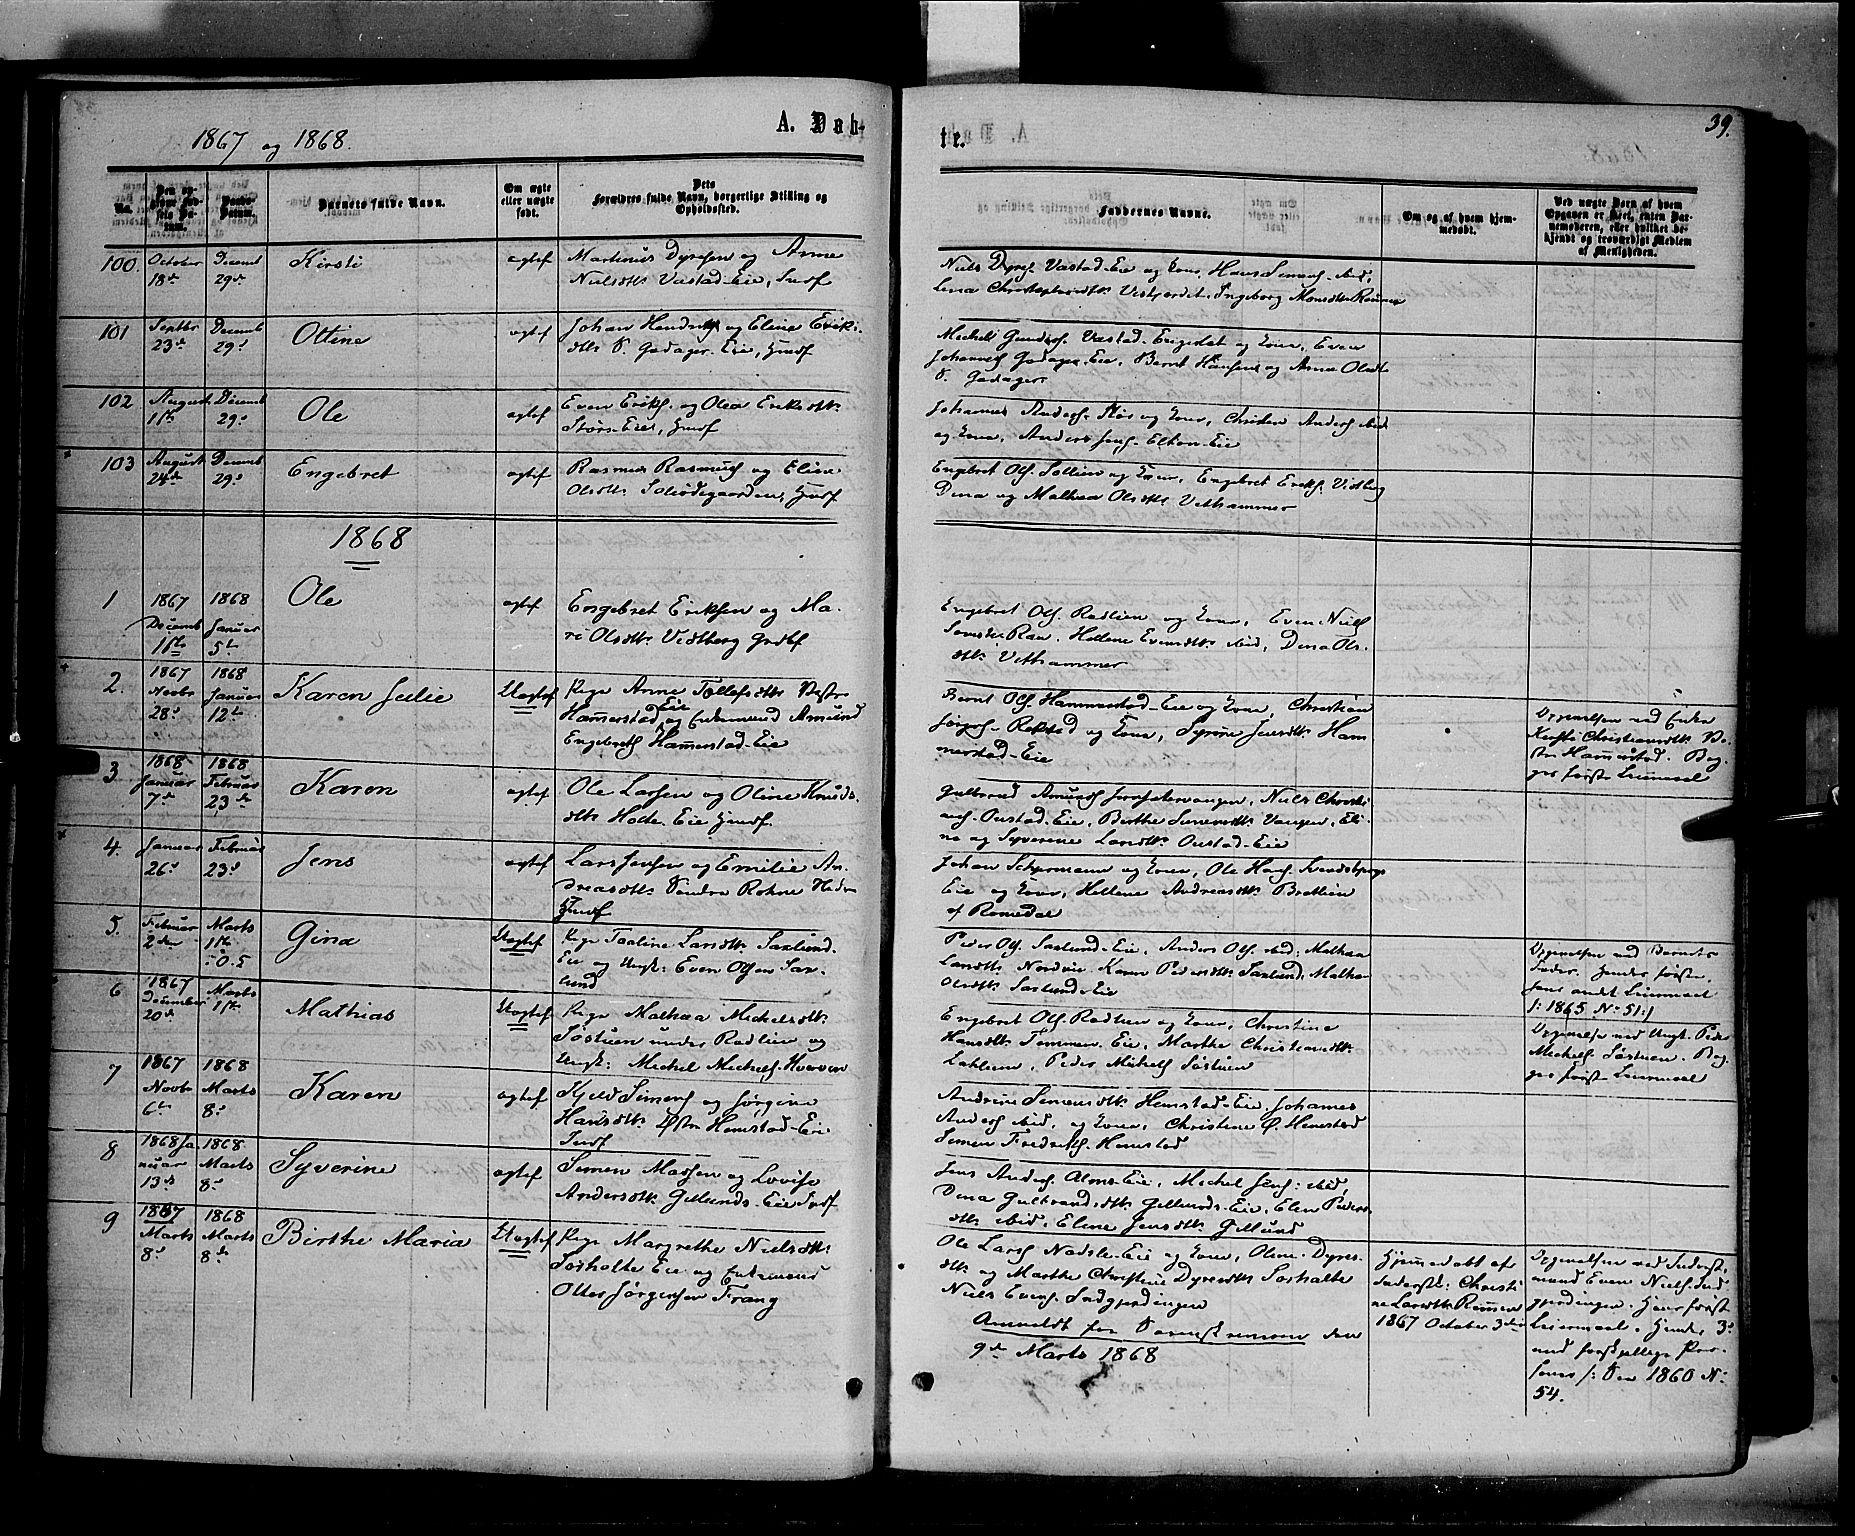 SAH, Stange prestekontor, K/L0013: Ministerialbok nr. 13, 1862-1879, s. 39